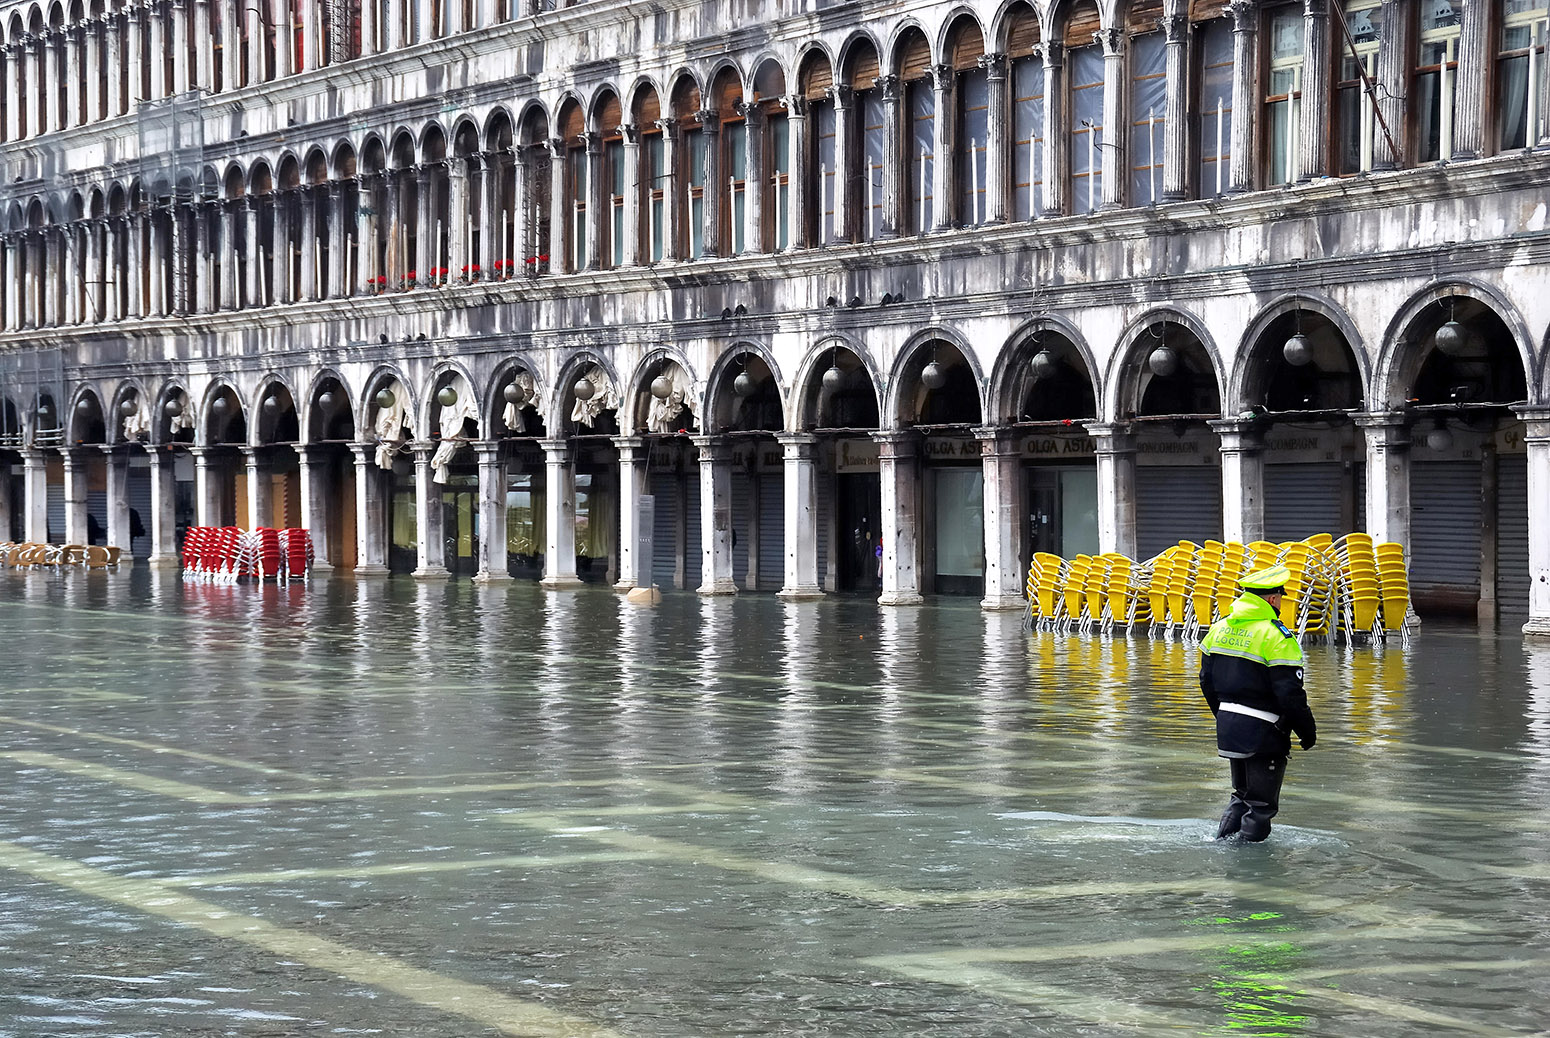 High water in Piazza San Marco, Venice, Italy. Credit: Ferdinando Piezzi / Alamy Stock Photo. HNH8M3